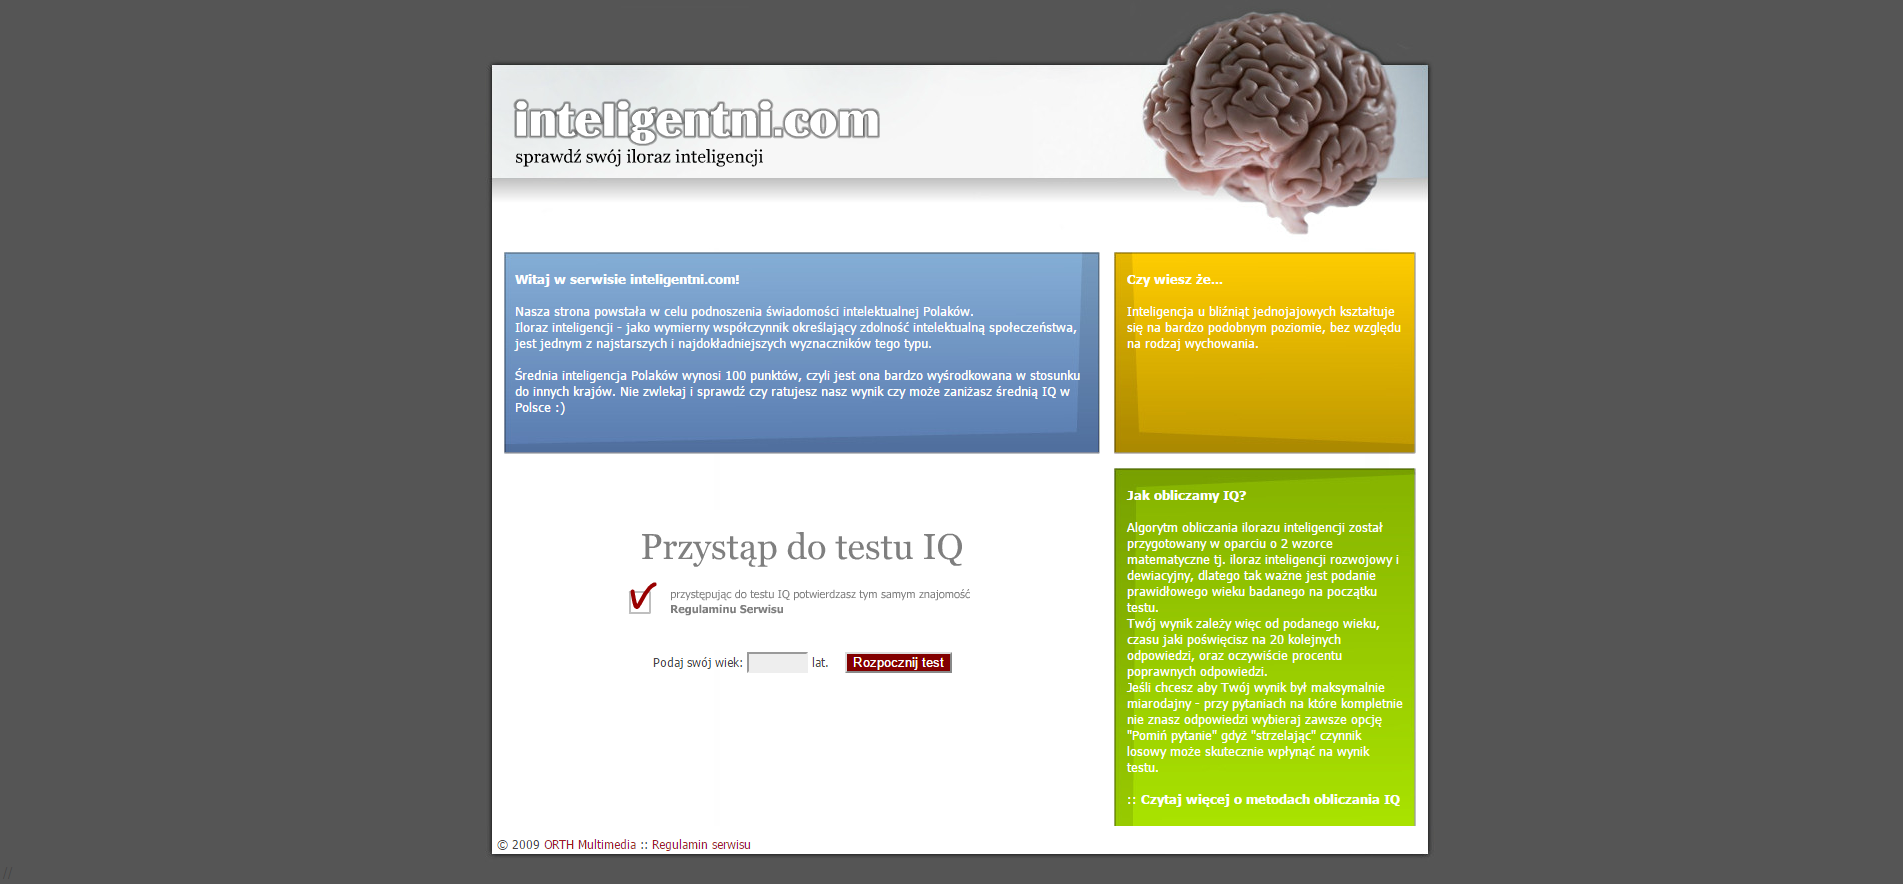 Inteligentni.com